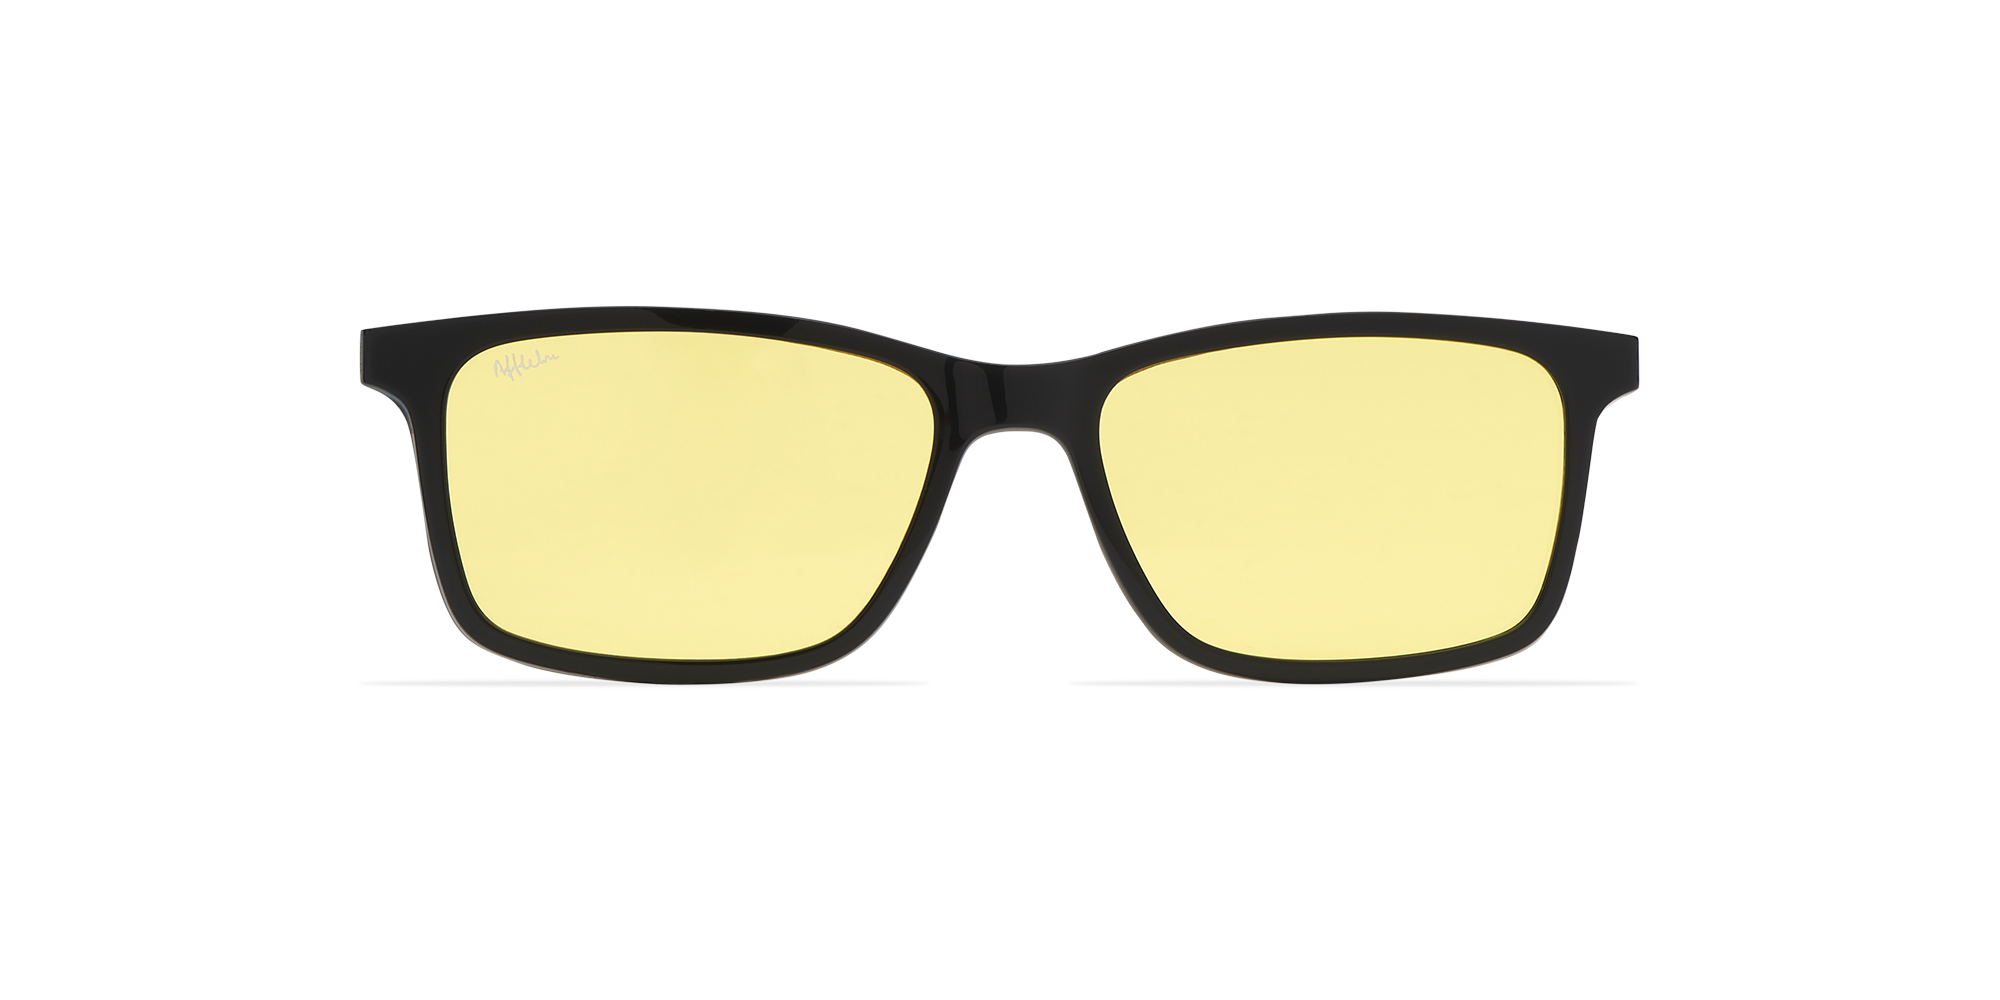 afflelou/france/products/smart_clip/clips_glasses/TMK32YEBK015316.png